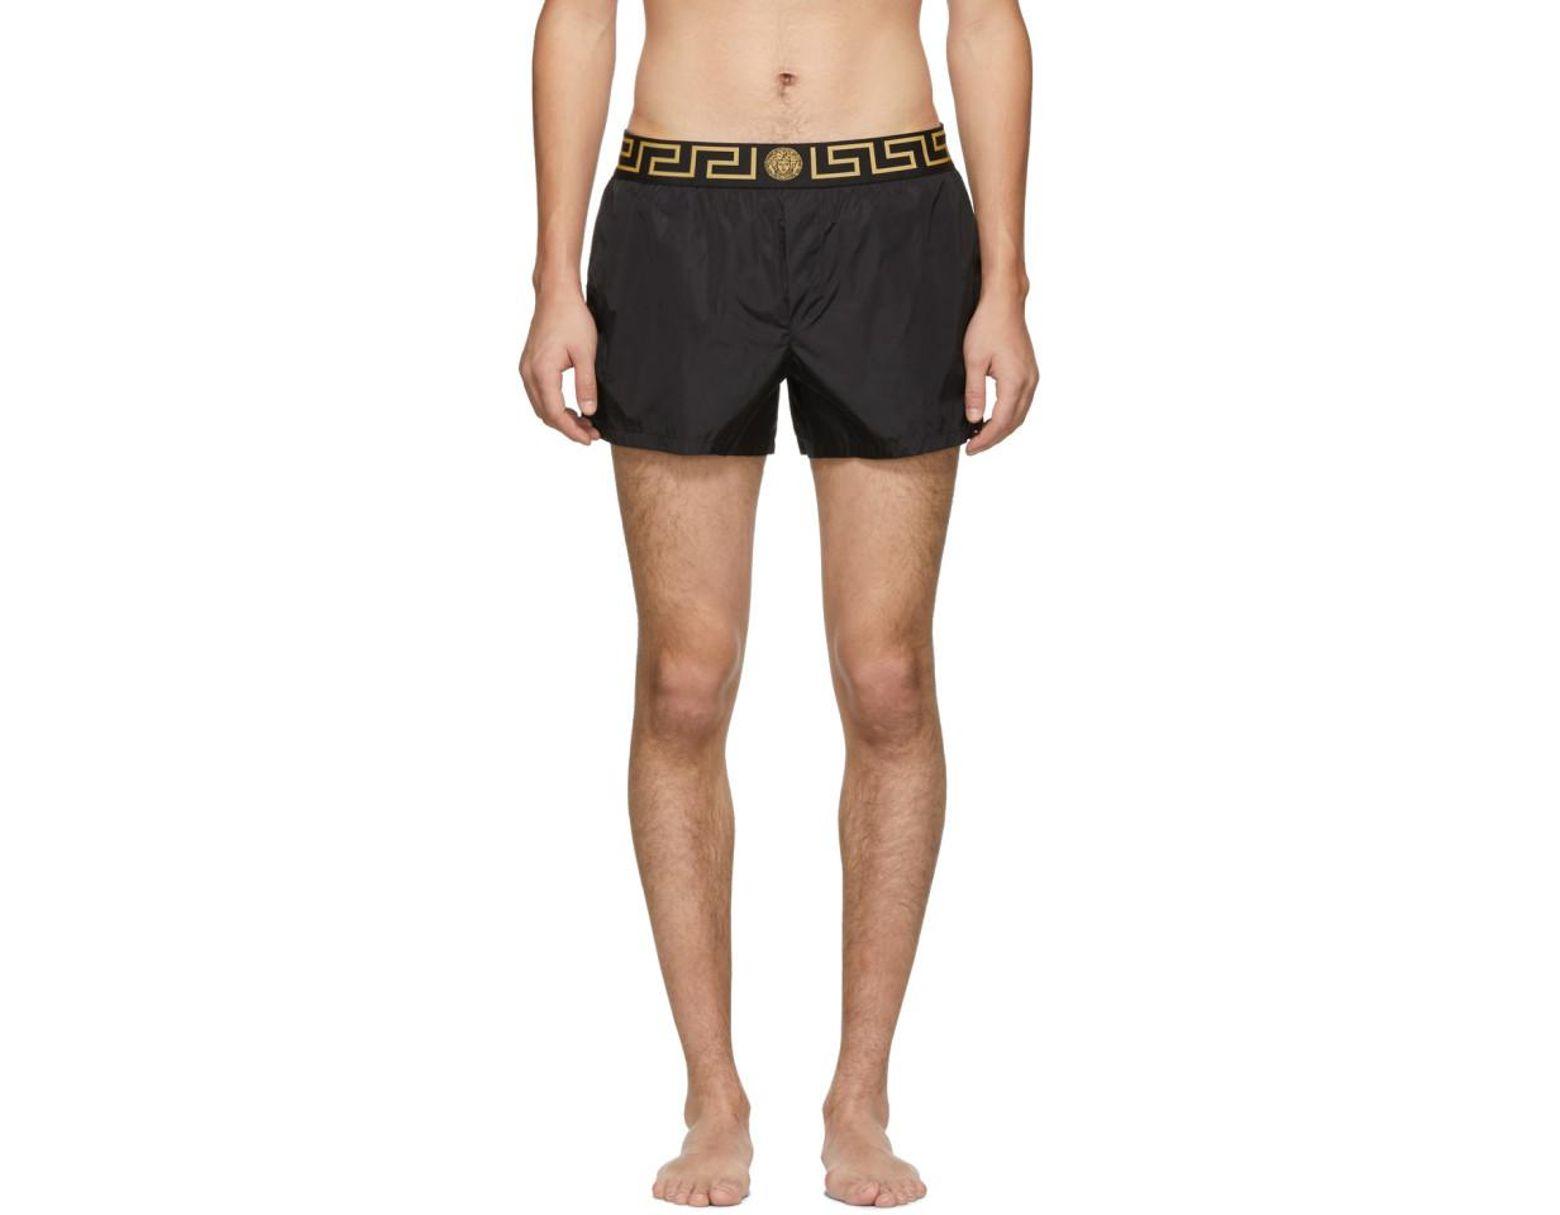 58597e97b665 Versace Black Greca Border Swim Shorts in Black for Men - Lyst